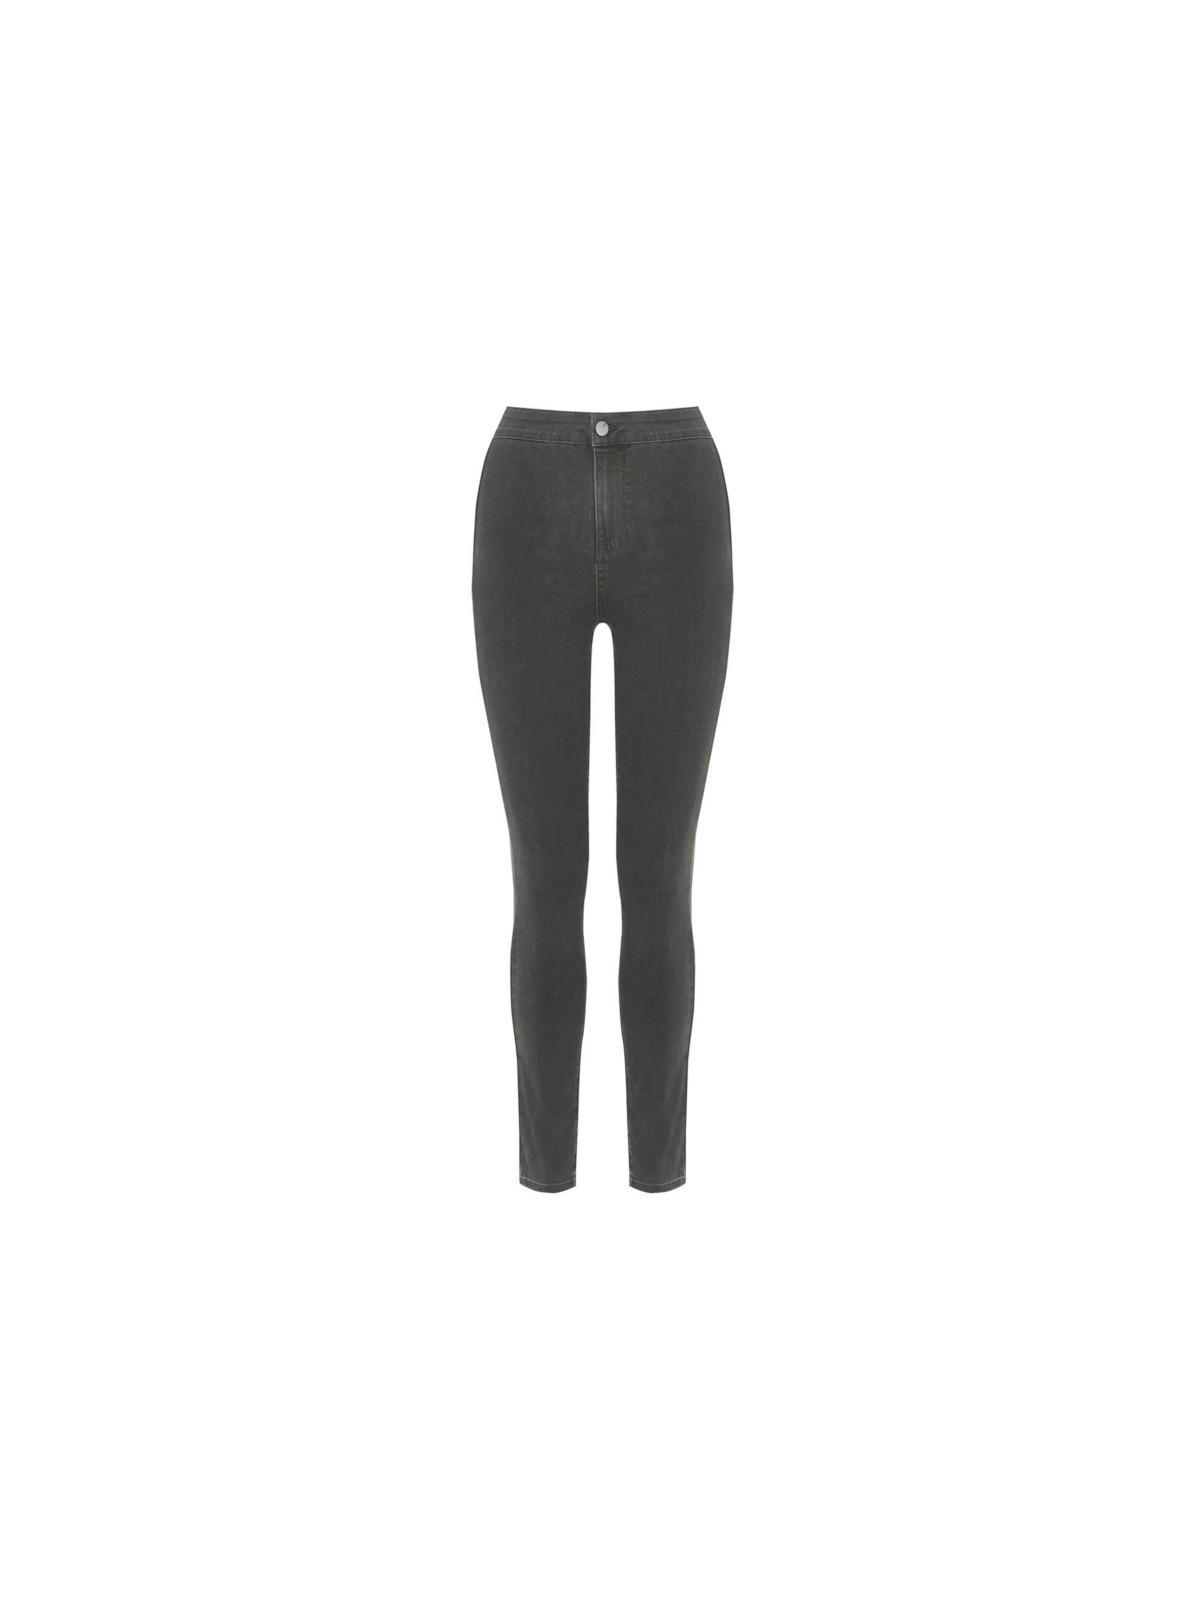 Oasis Denim Riley Jeans in Mid Grey (Grey)